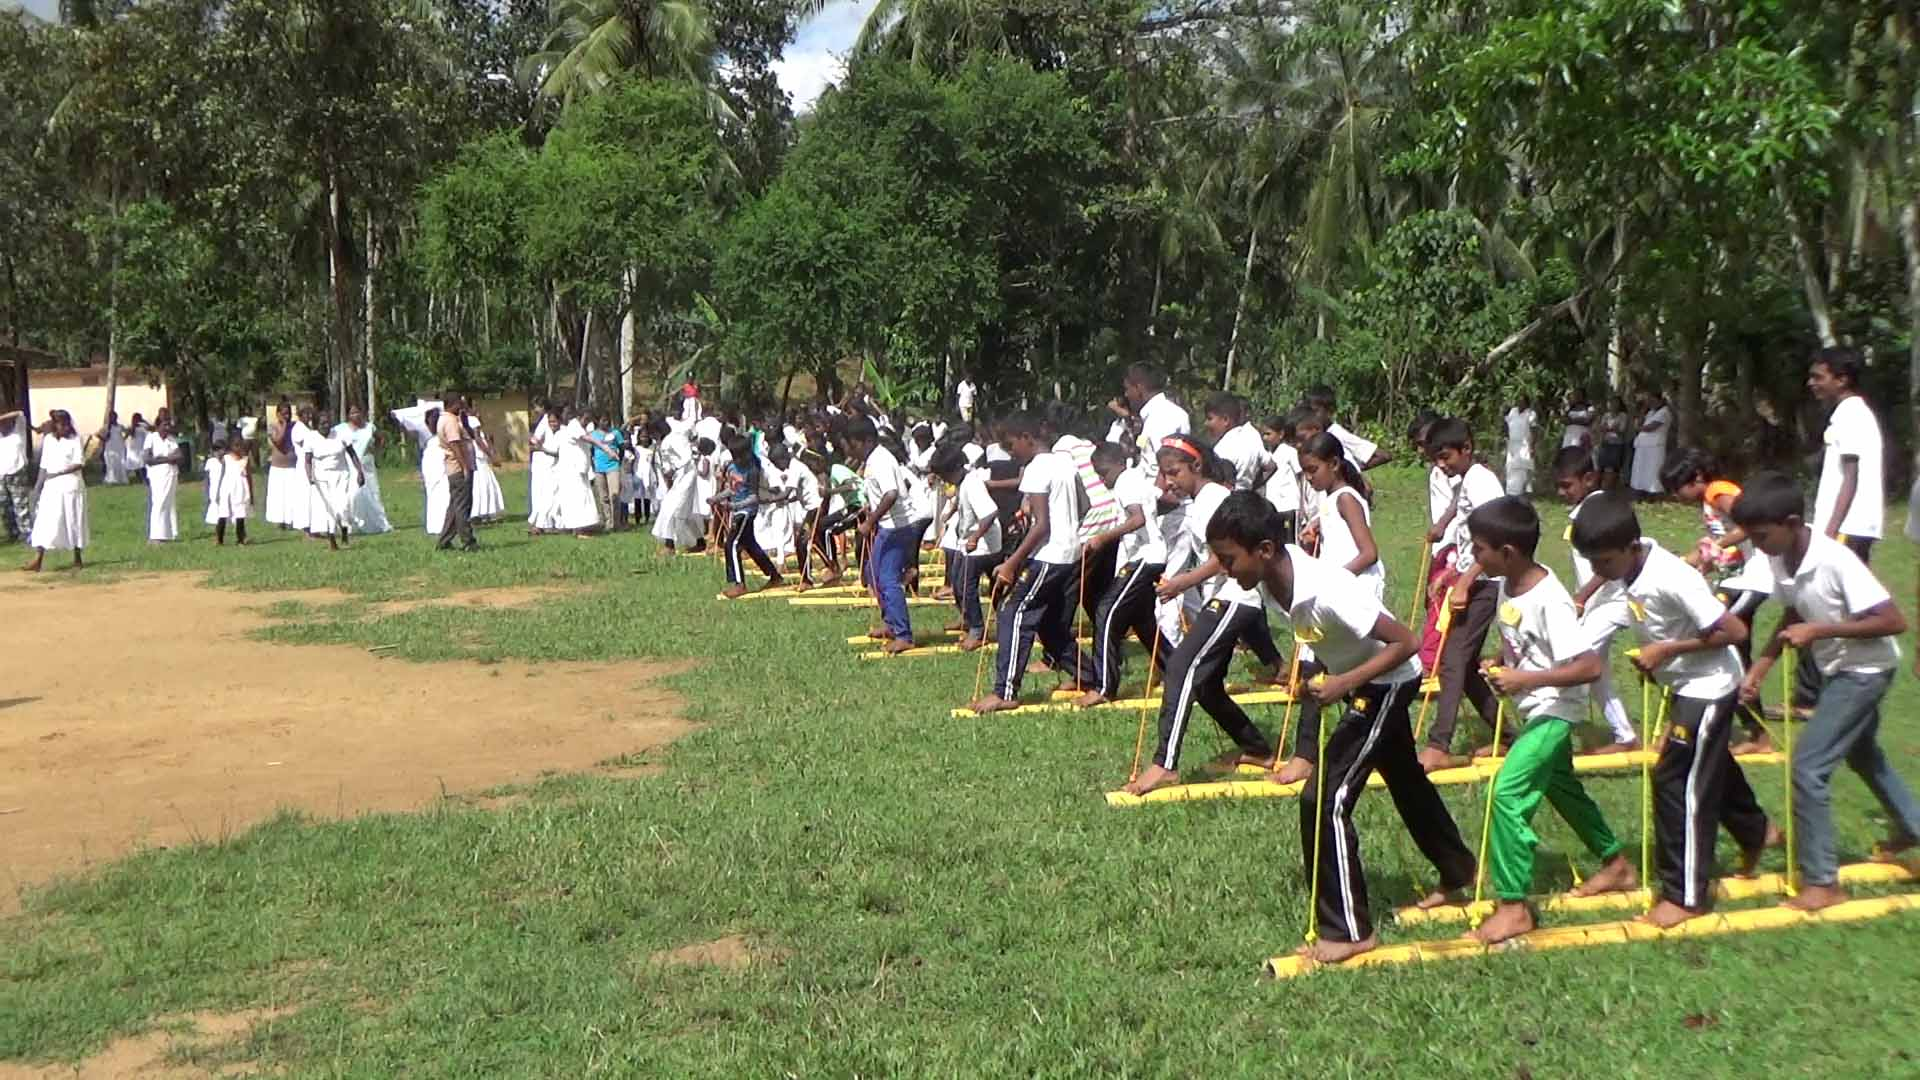 Sati Pasala Mindfulness Camp at Meethirigala Kanishta Vidyalaya-mindful games (15)